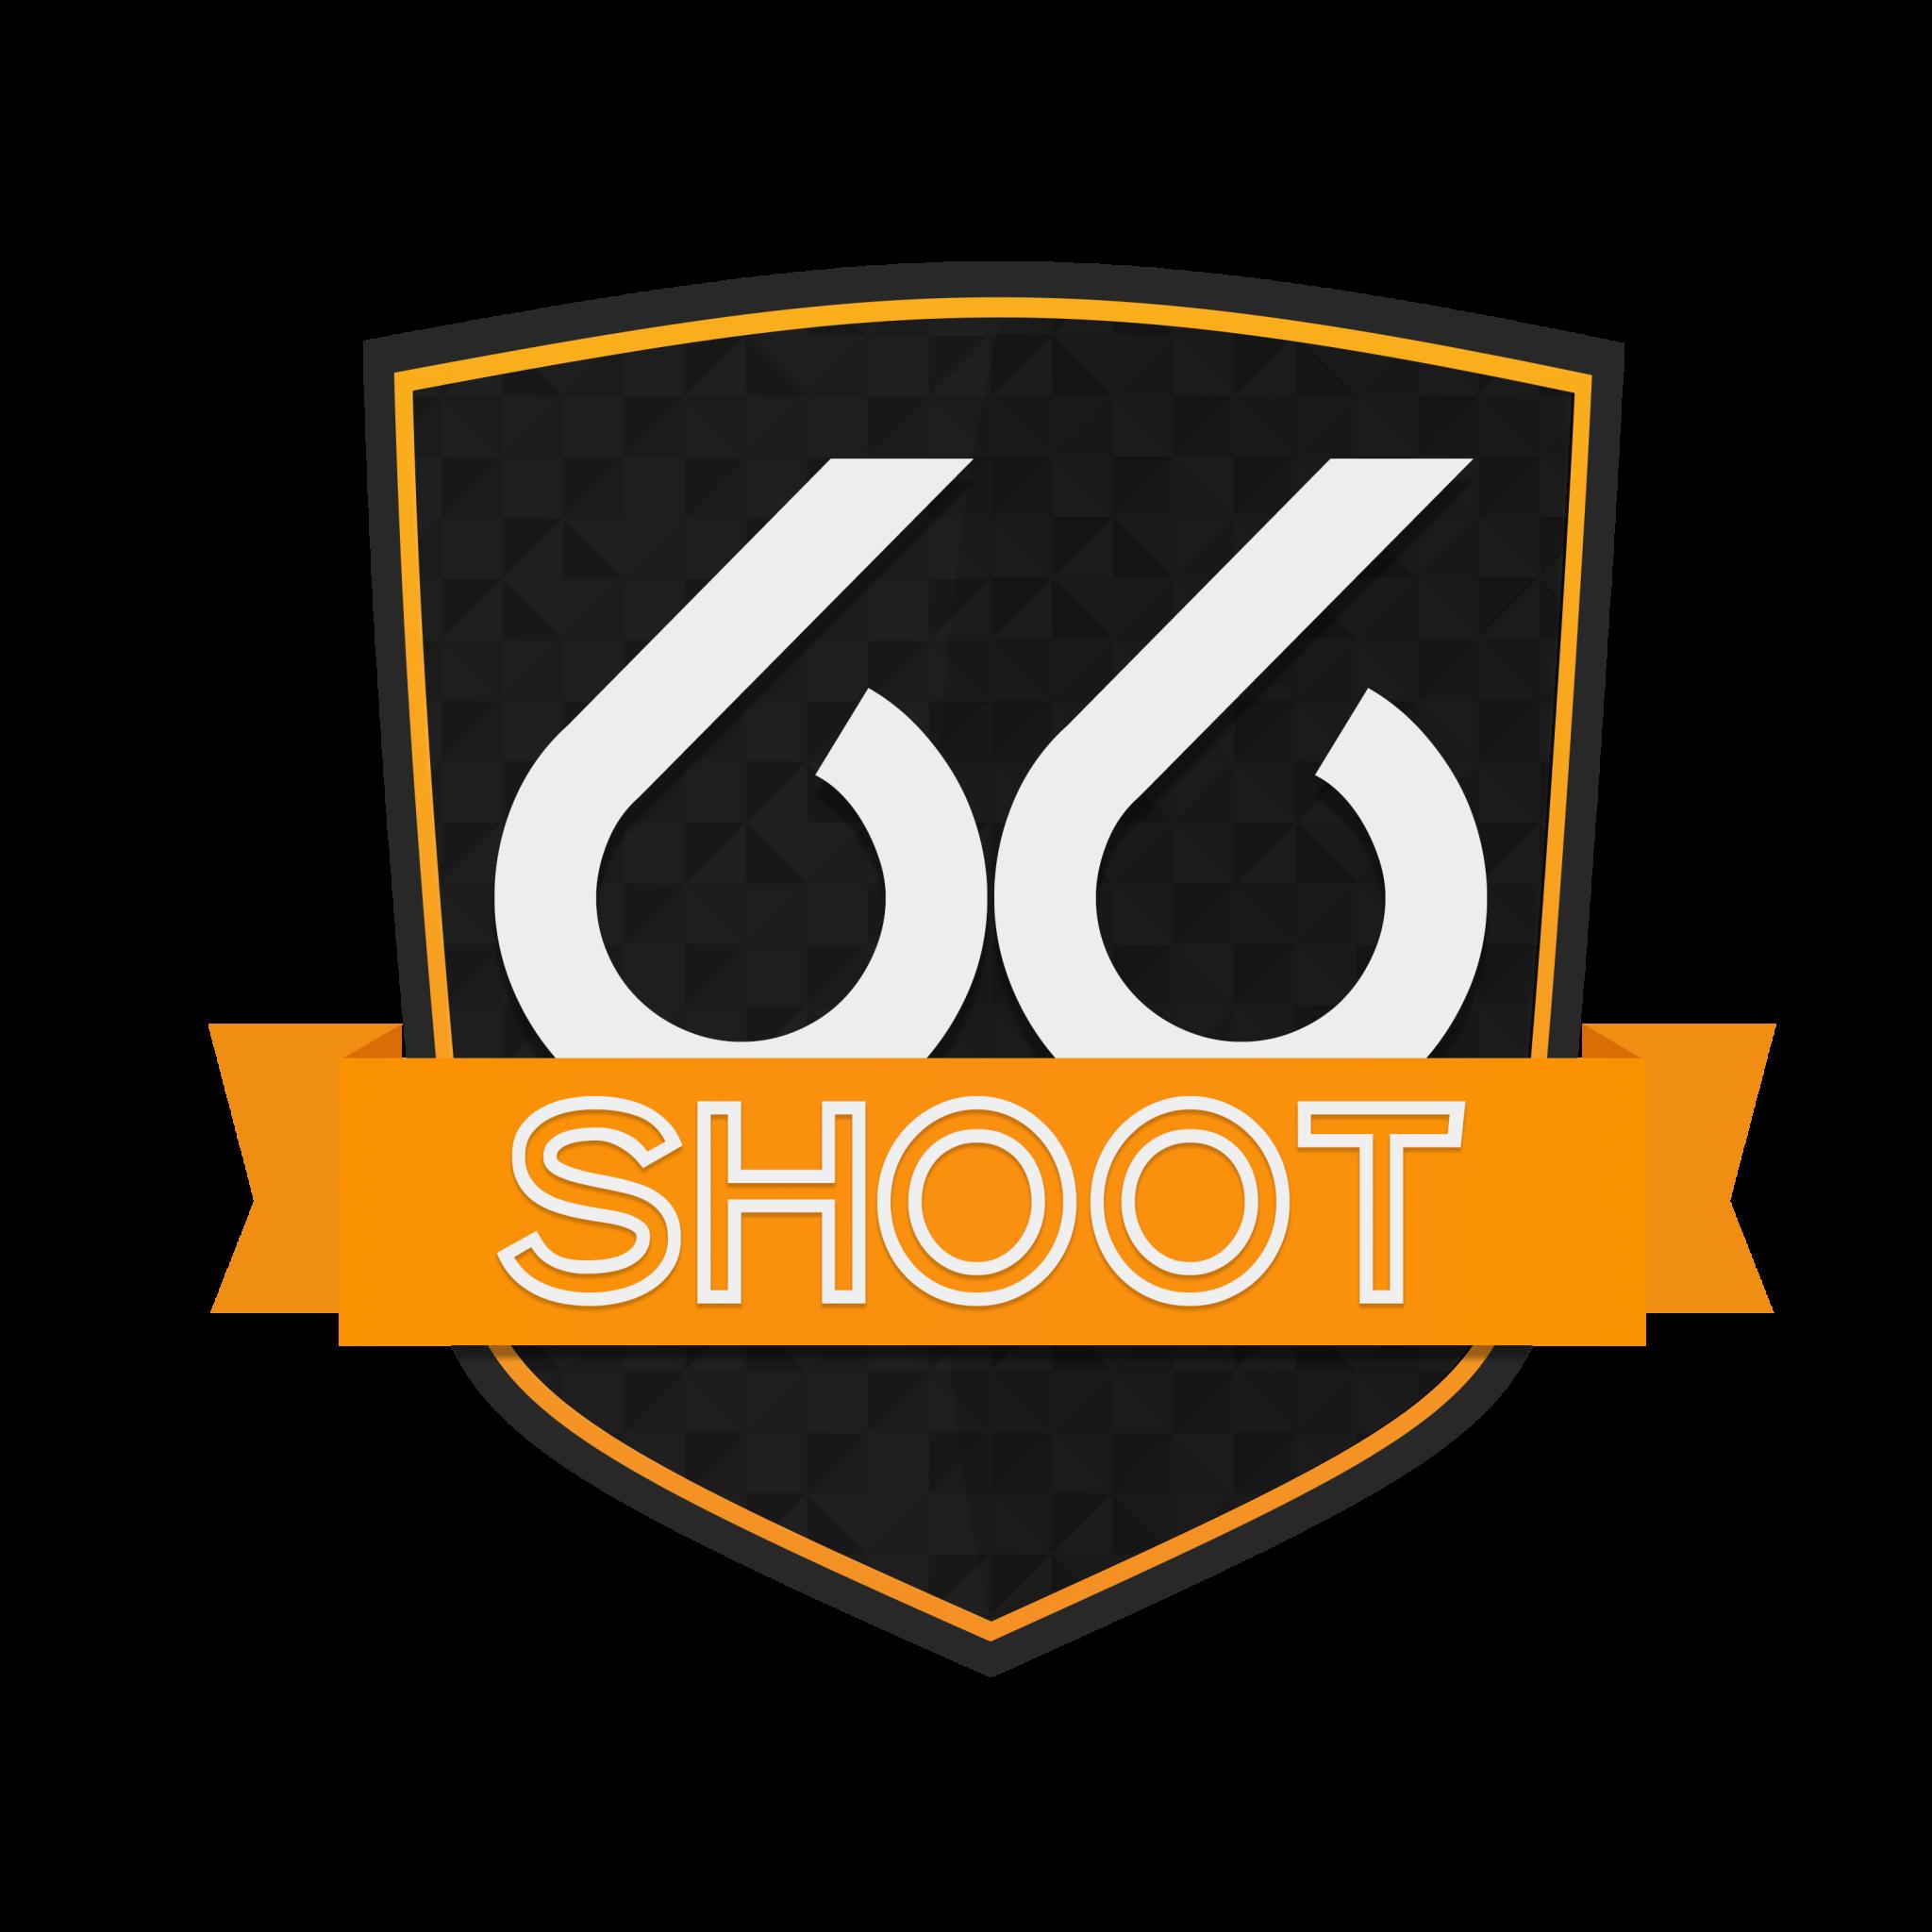 Shoot66